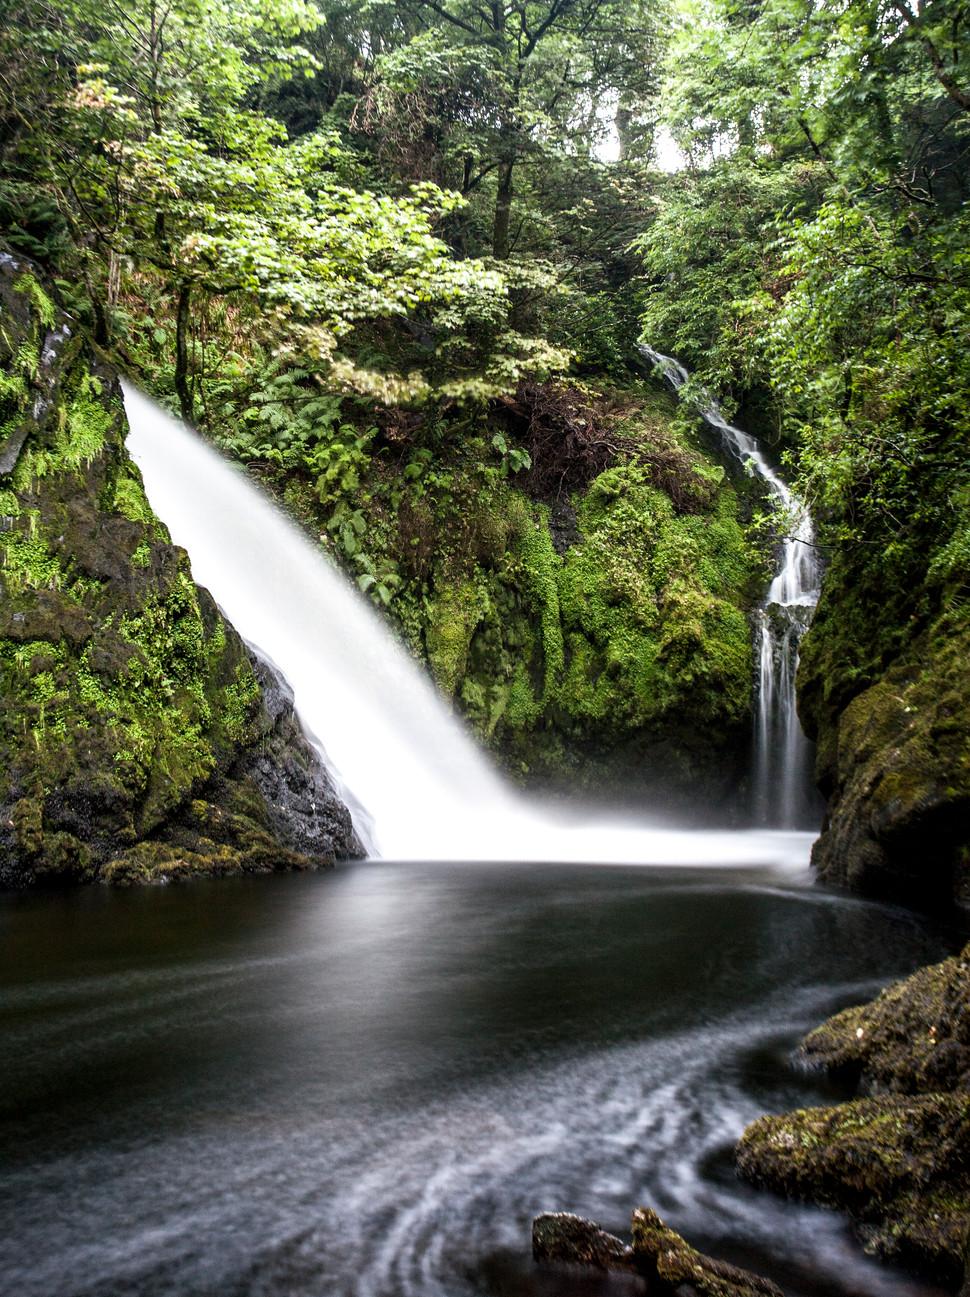 Llanberris waterfalls